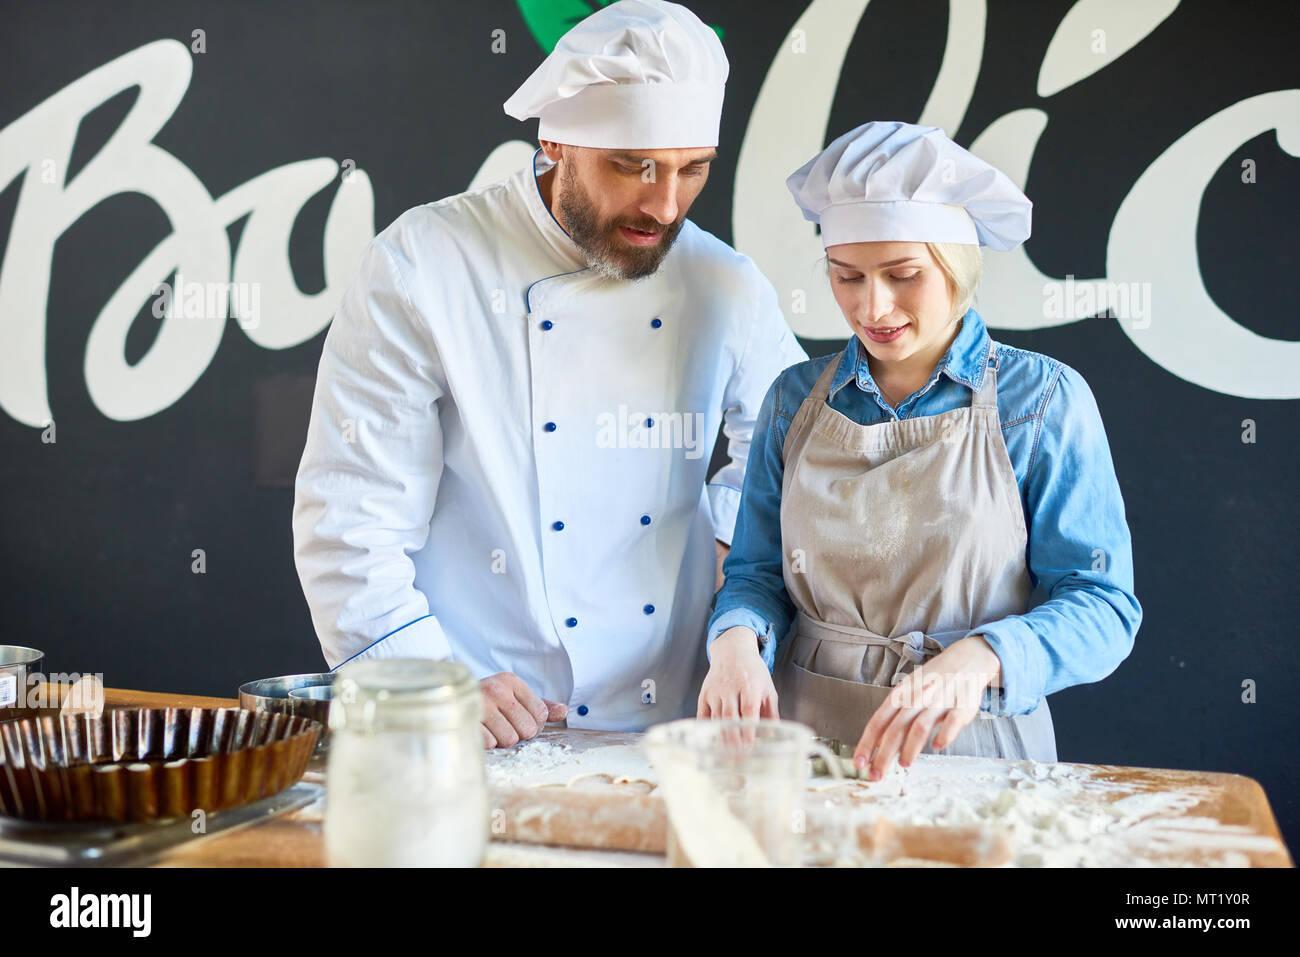 Arte culinaria Immagini Stock